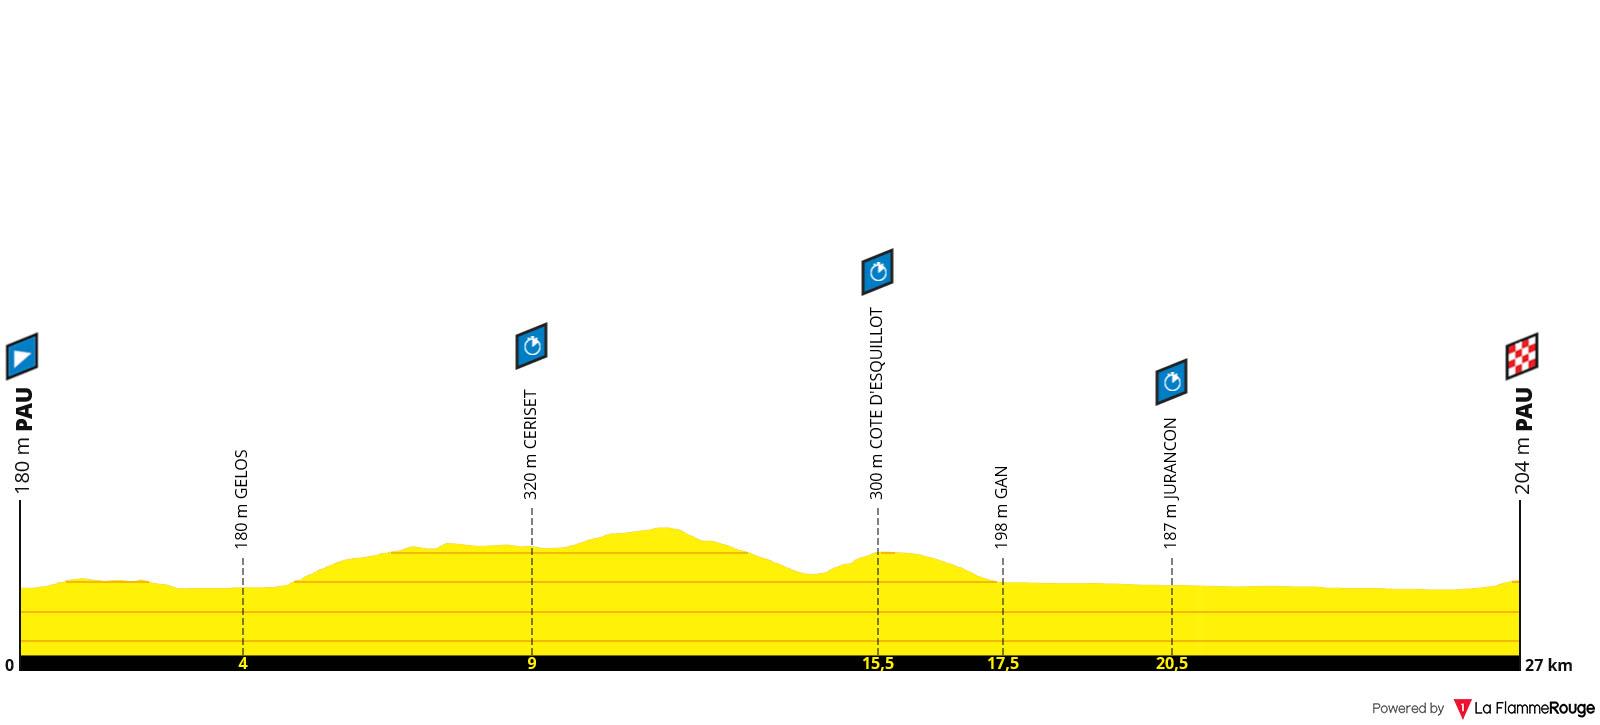 Perfil Etapa 13 - Tour de Francia 2019